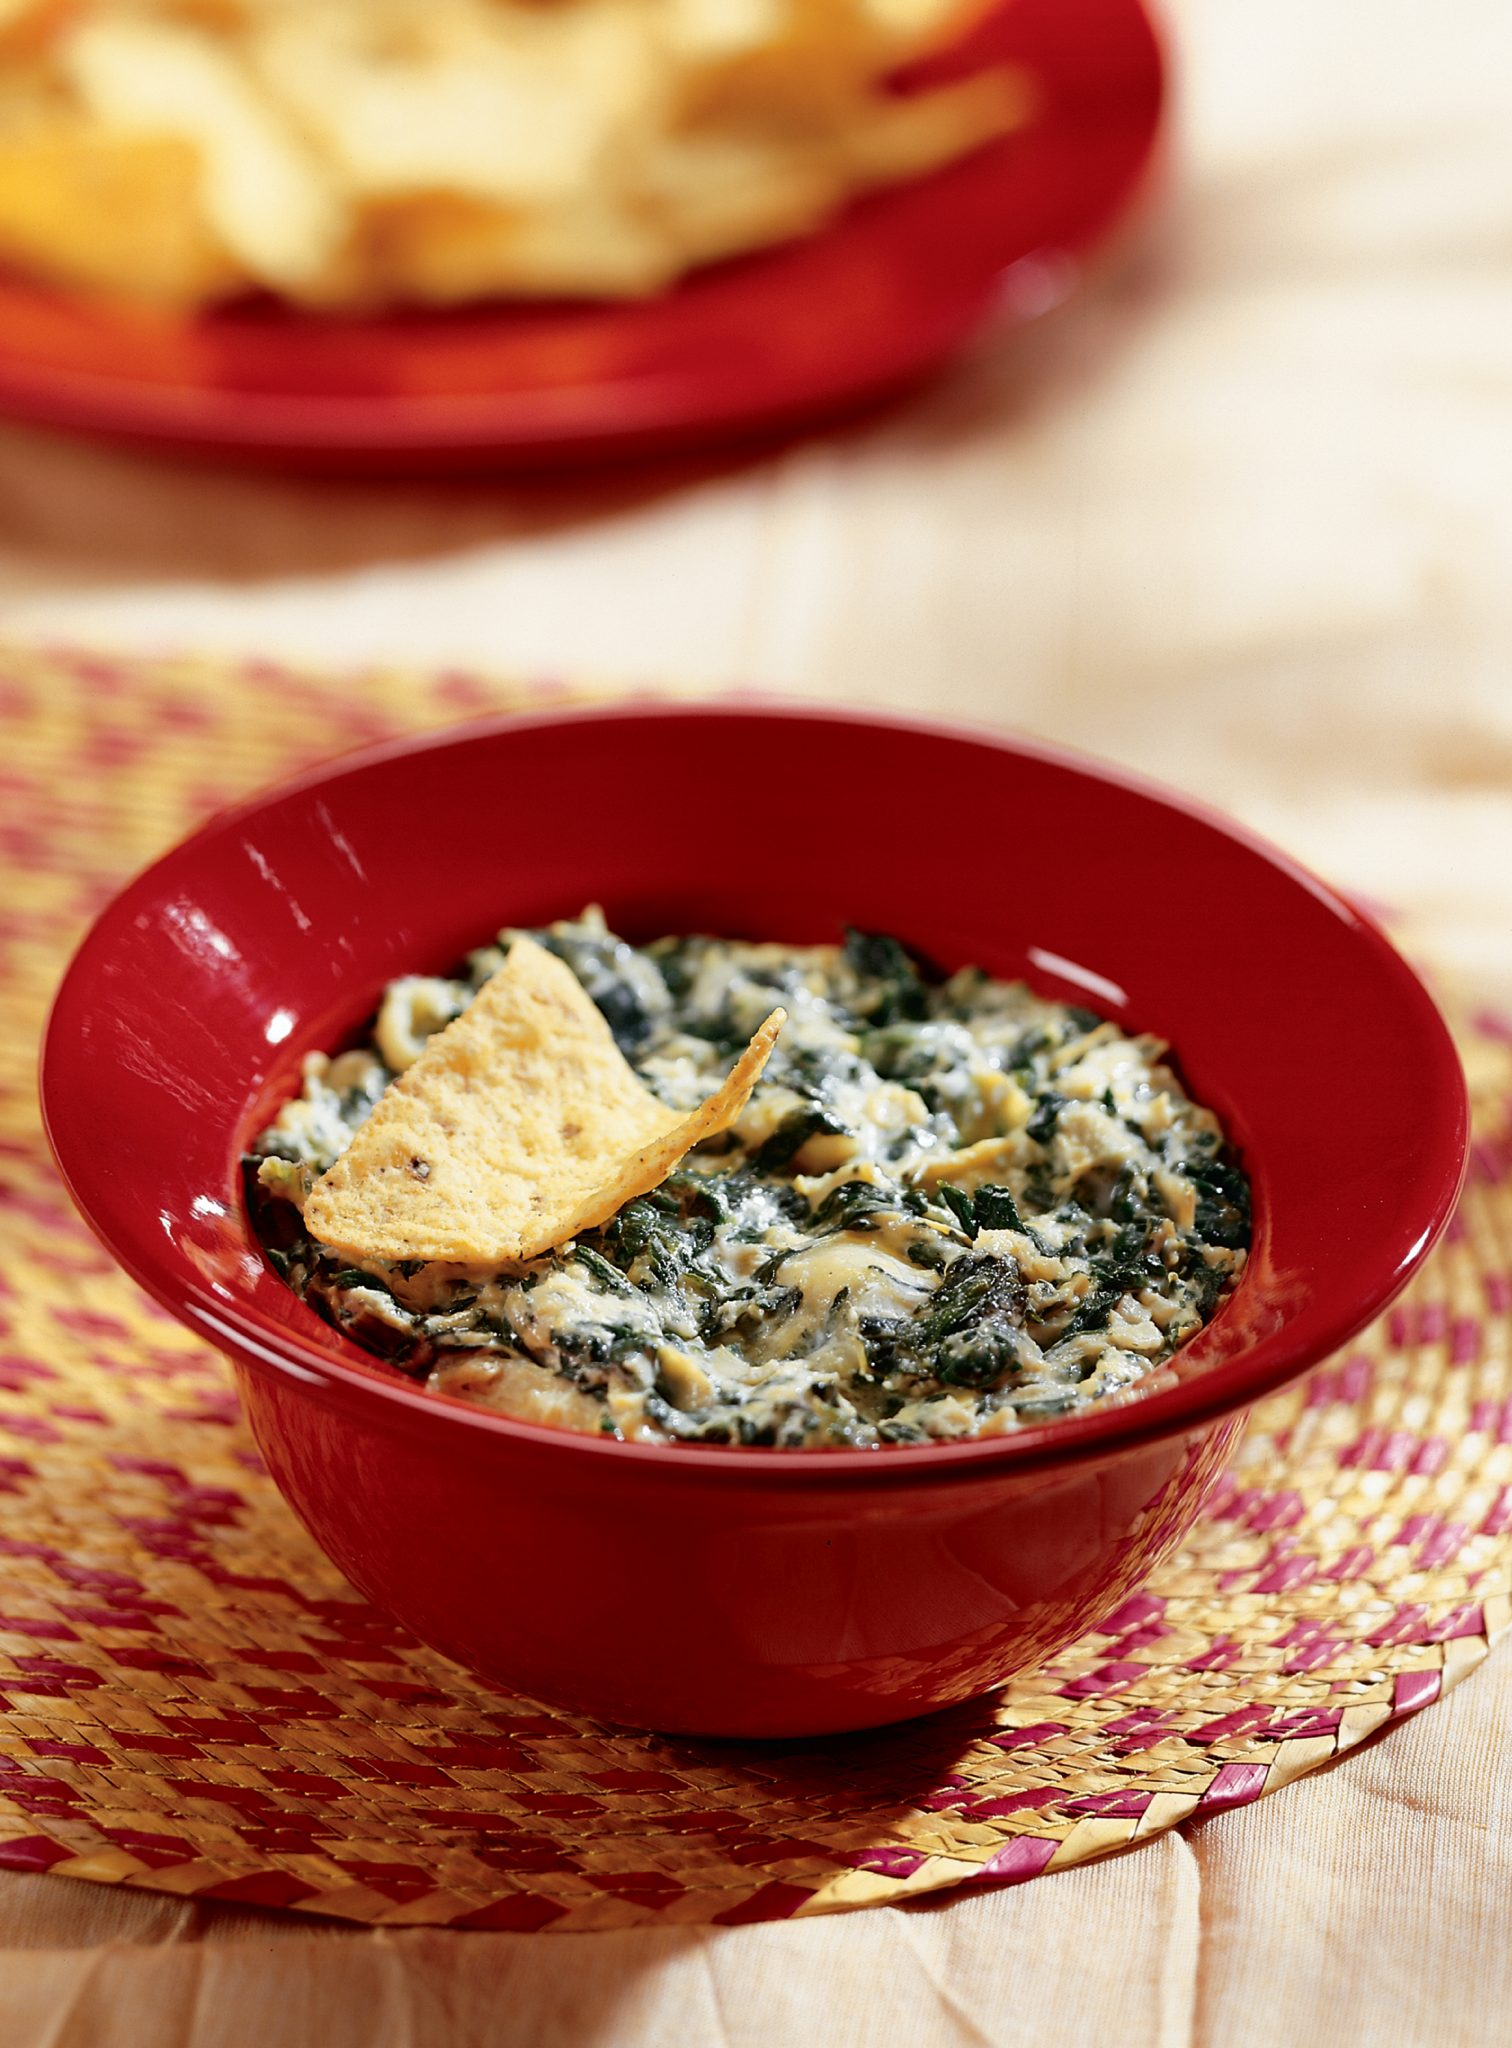 Sumptuous Spinach Artichoke Dip